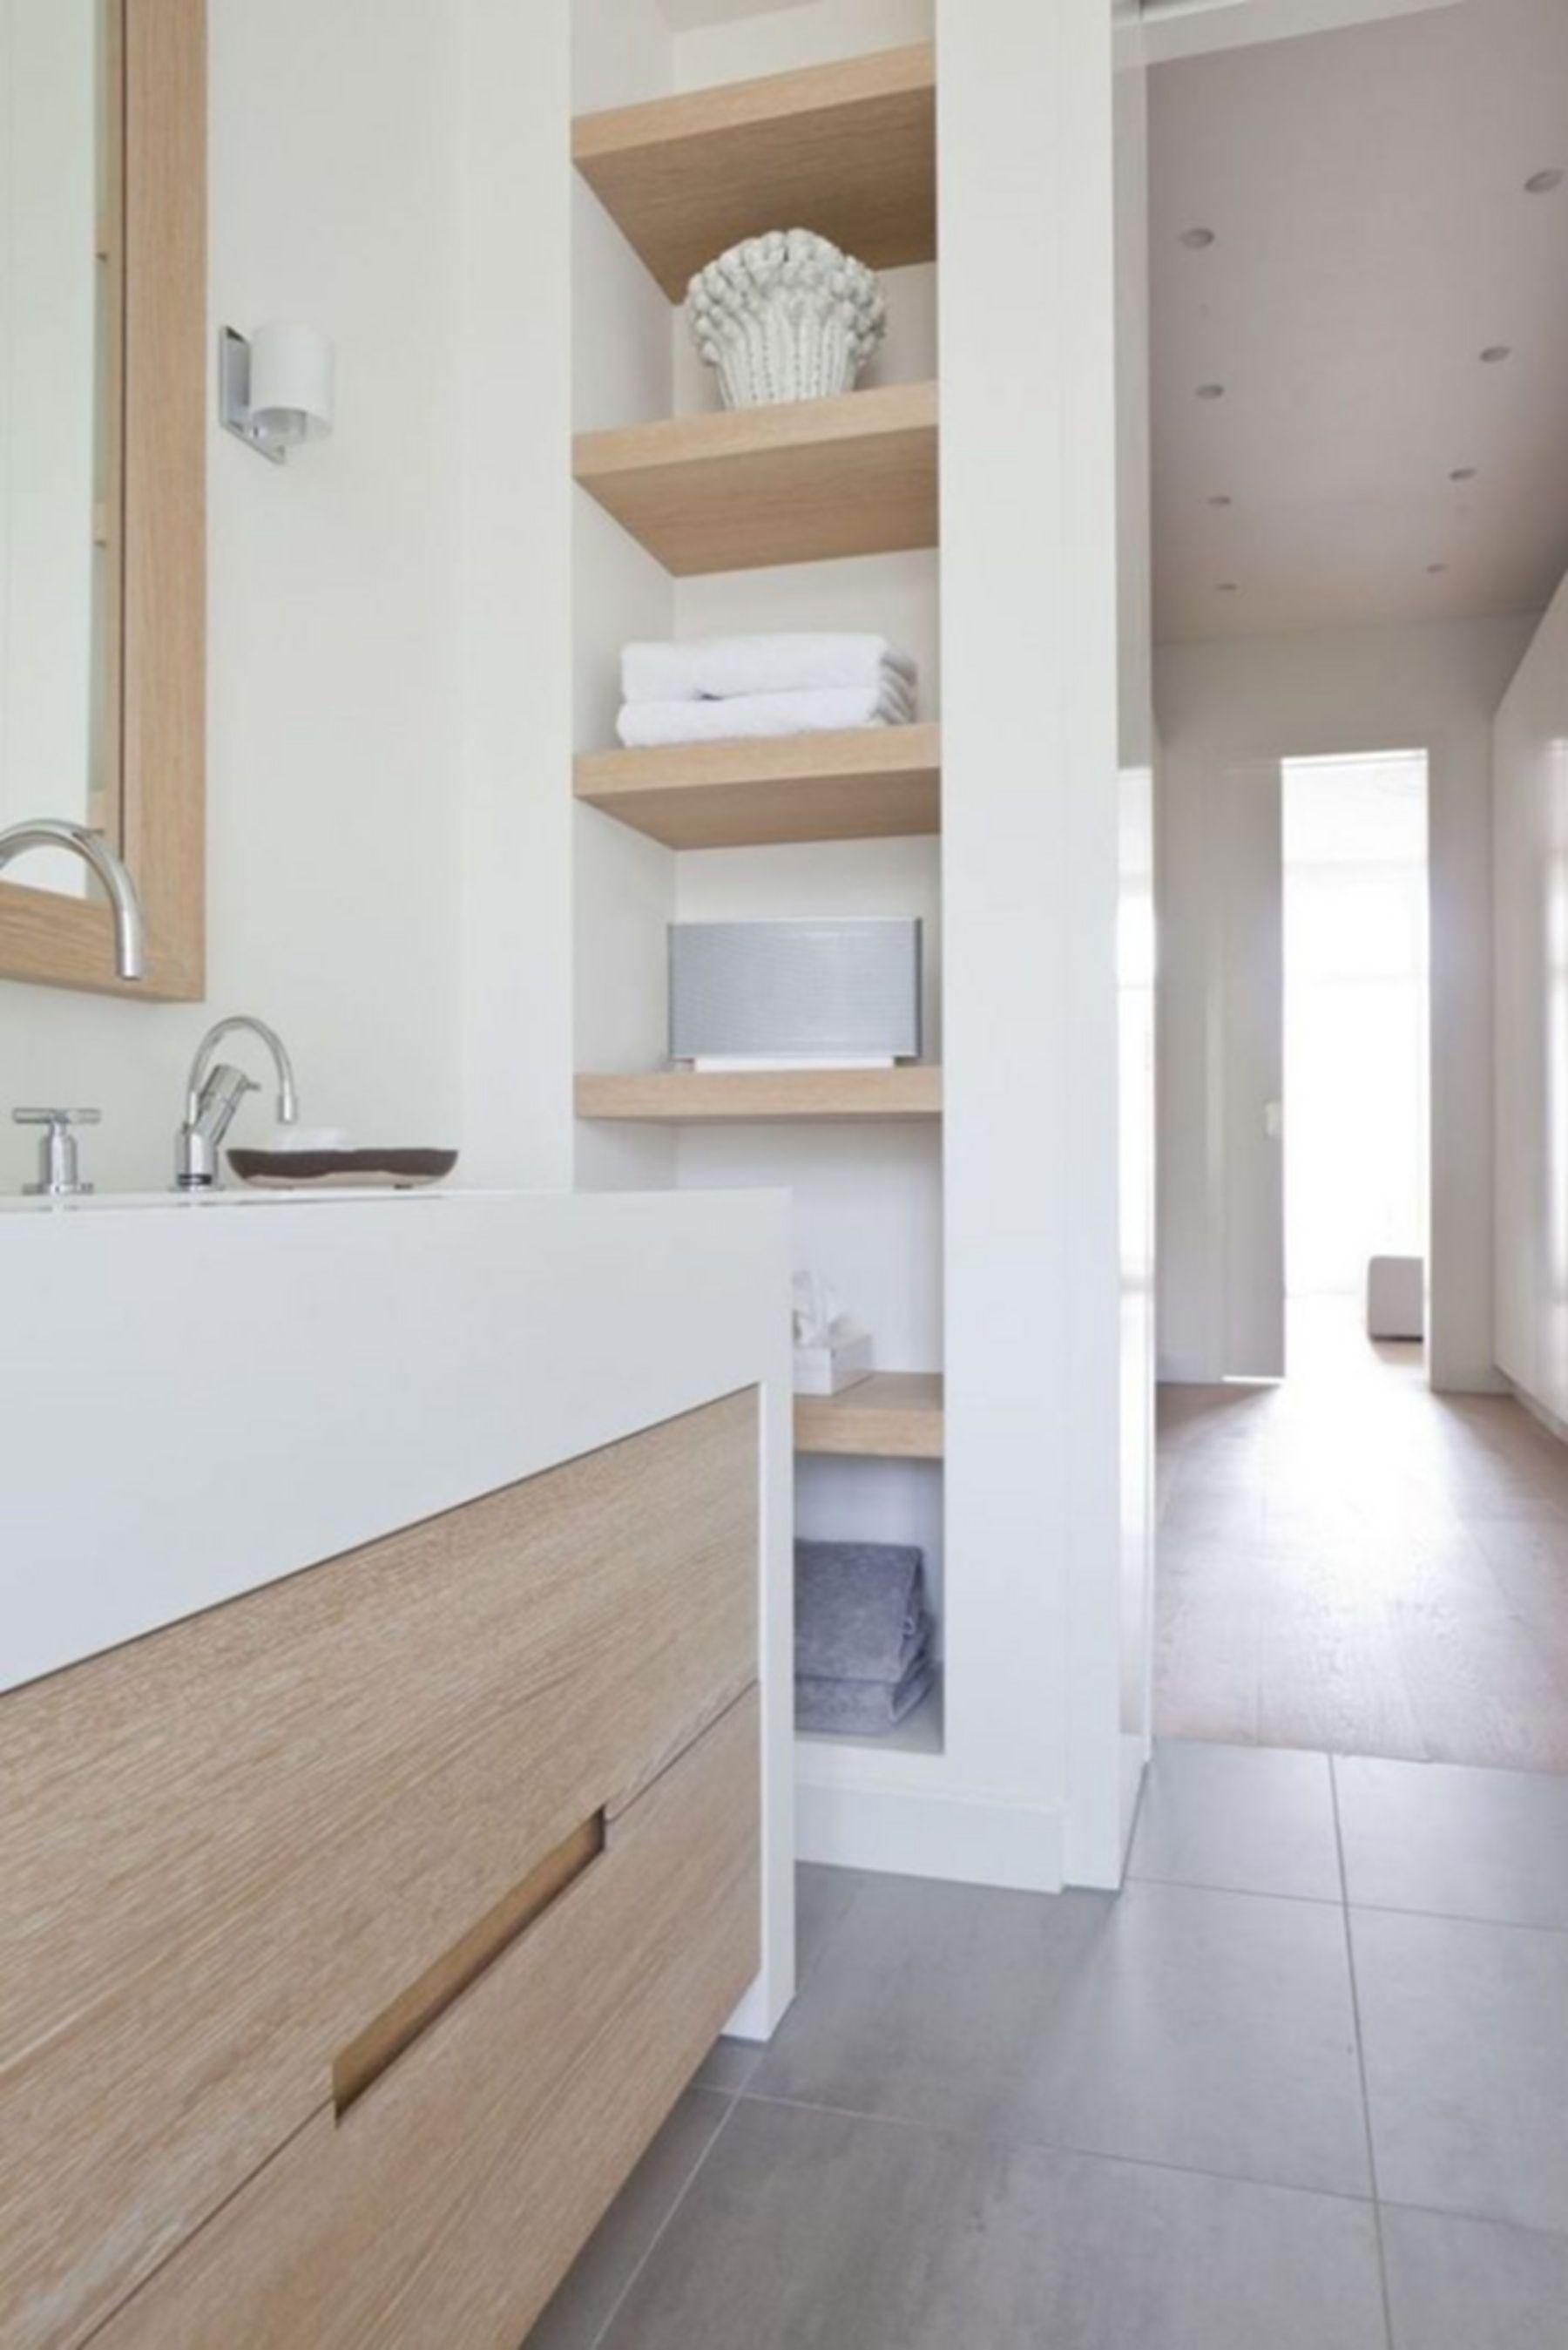 12 Attractive Minimalist Bathroom Design Ideas On A Budget